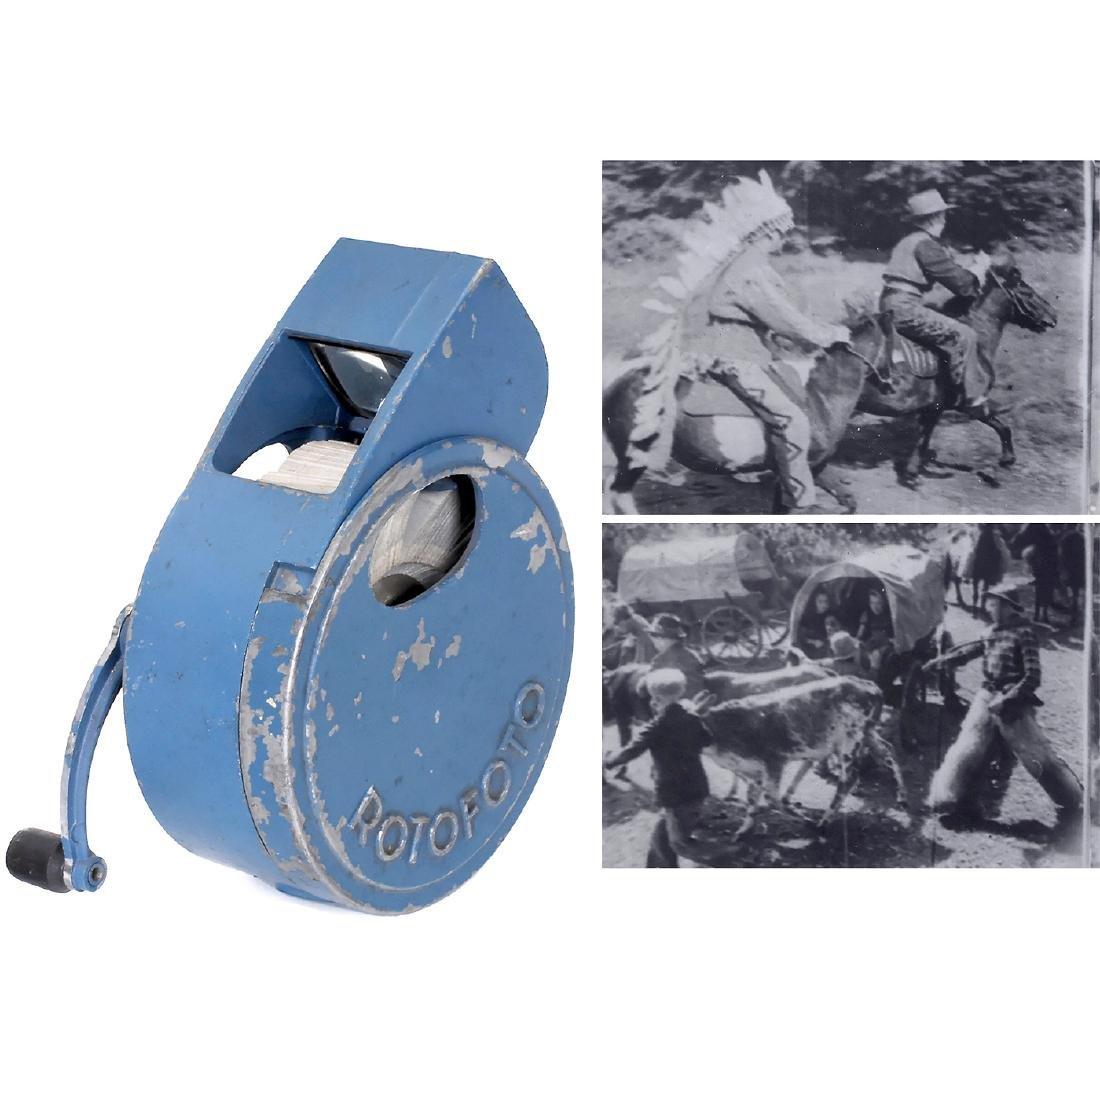 Rotofoto Mutoscope, c. 1910